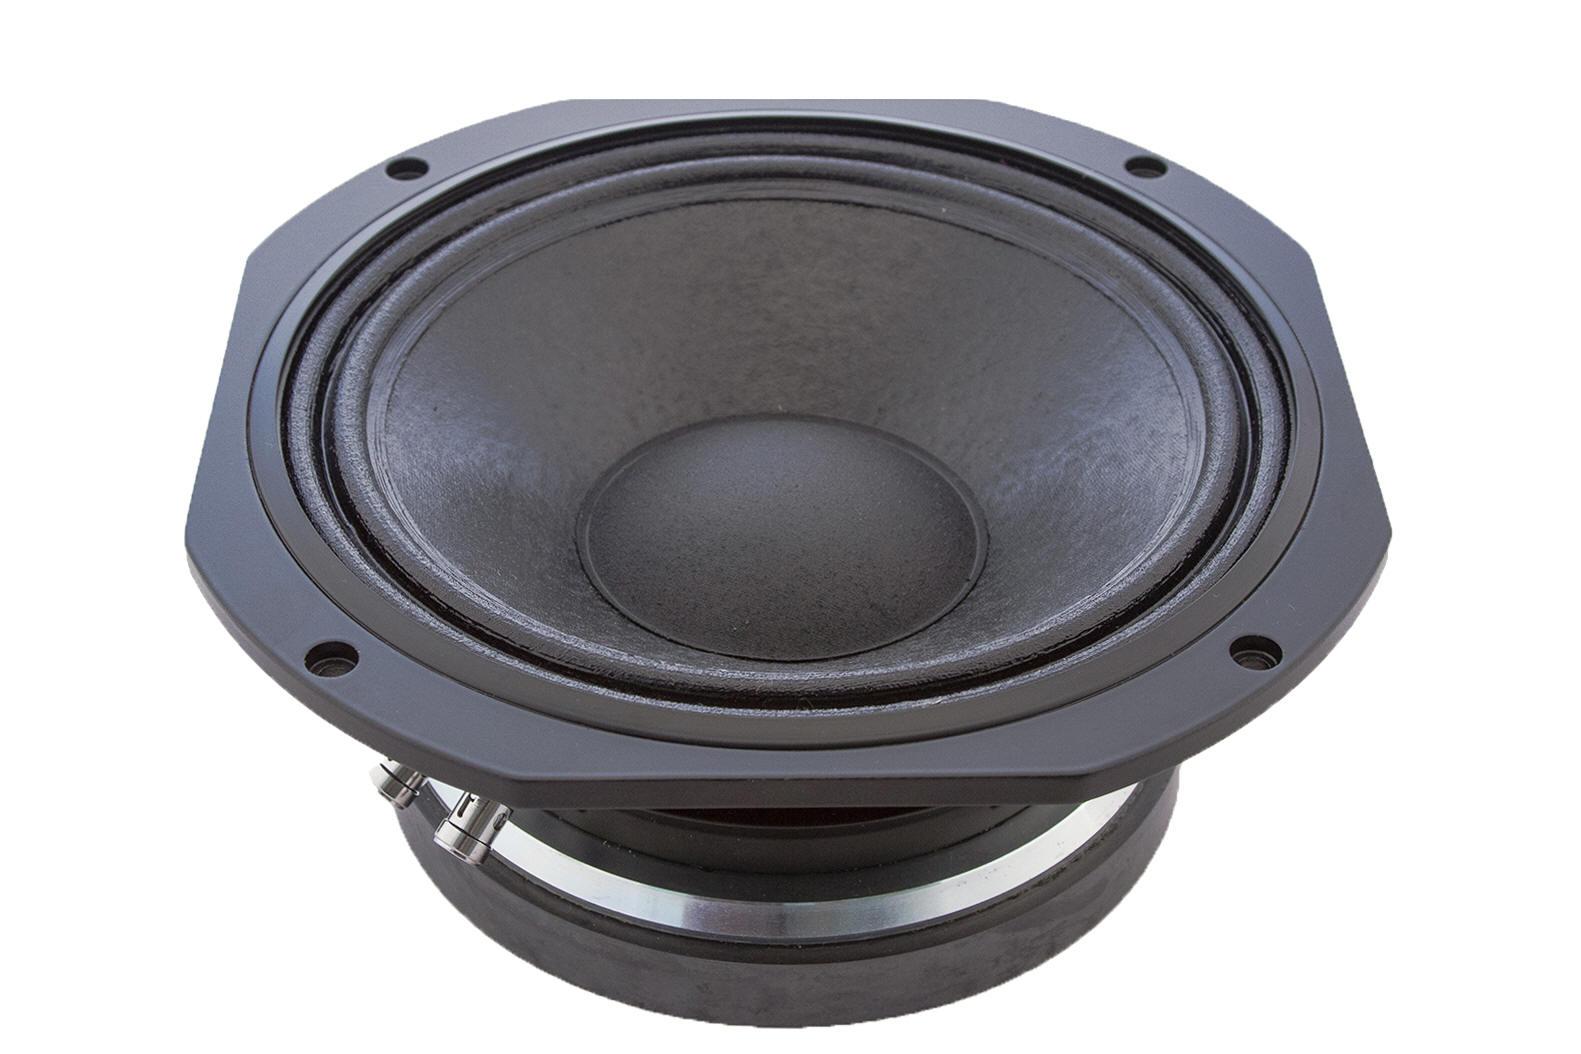 volt speakers 2002 dodge ram stereo wiring diagram audio constructor loudspeaker specialist